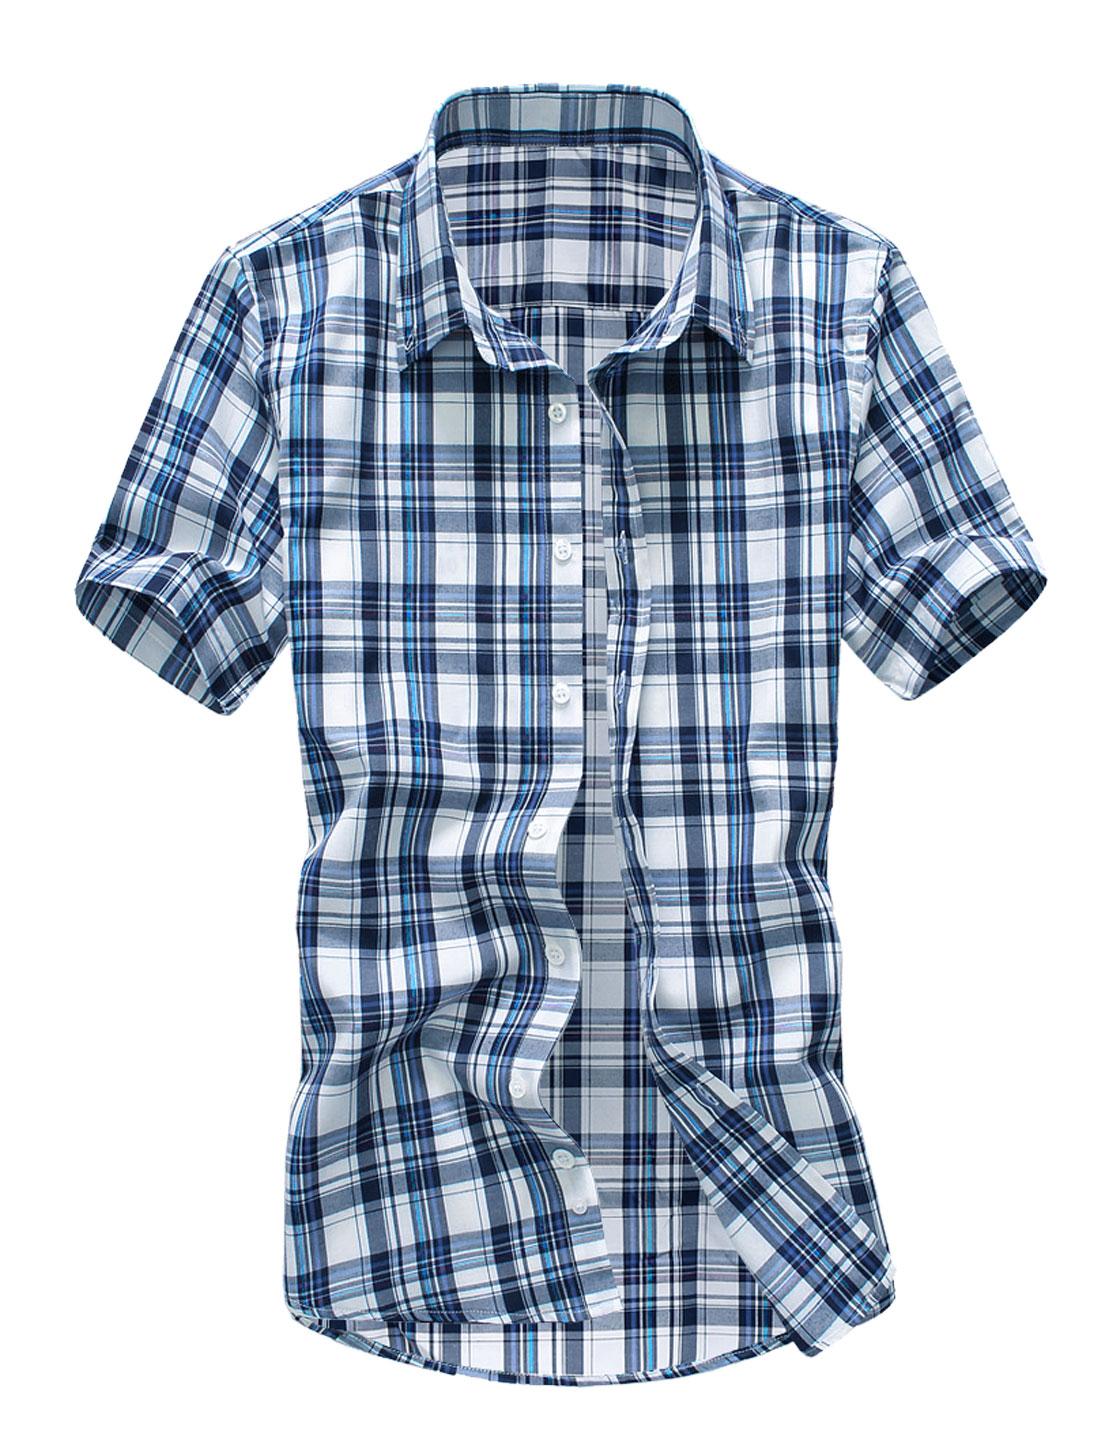 Men Point Collar Short Sleeve Plaids Button Down Shirt Purple M